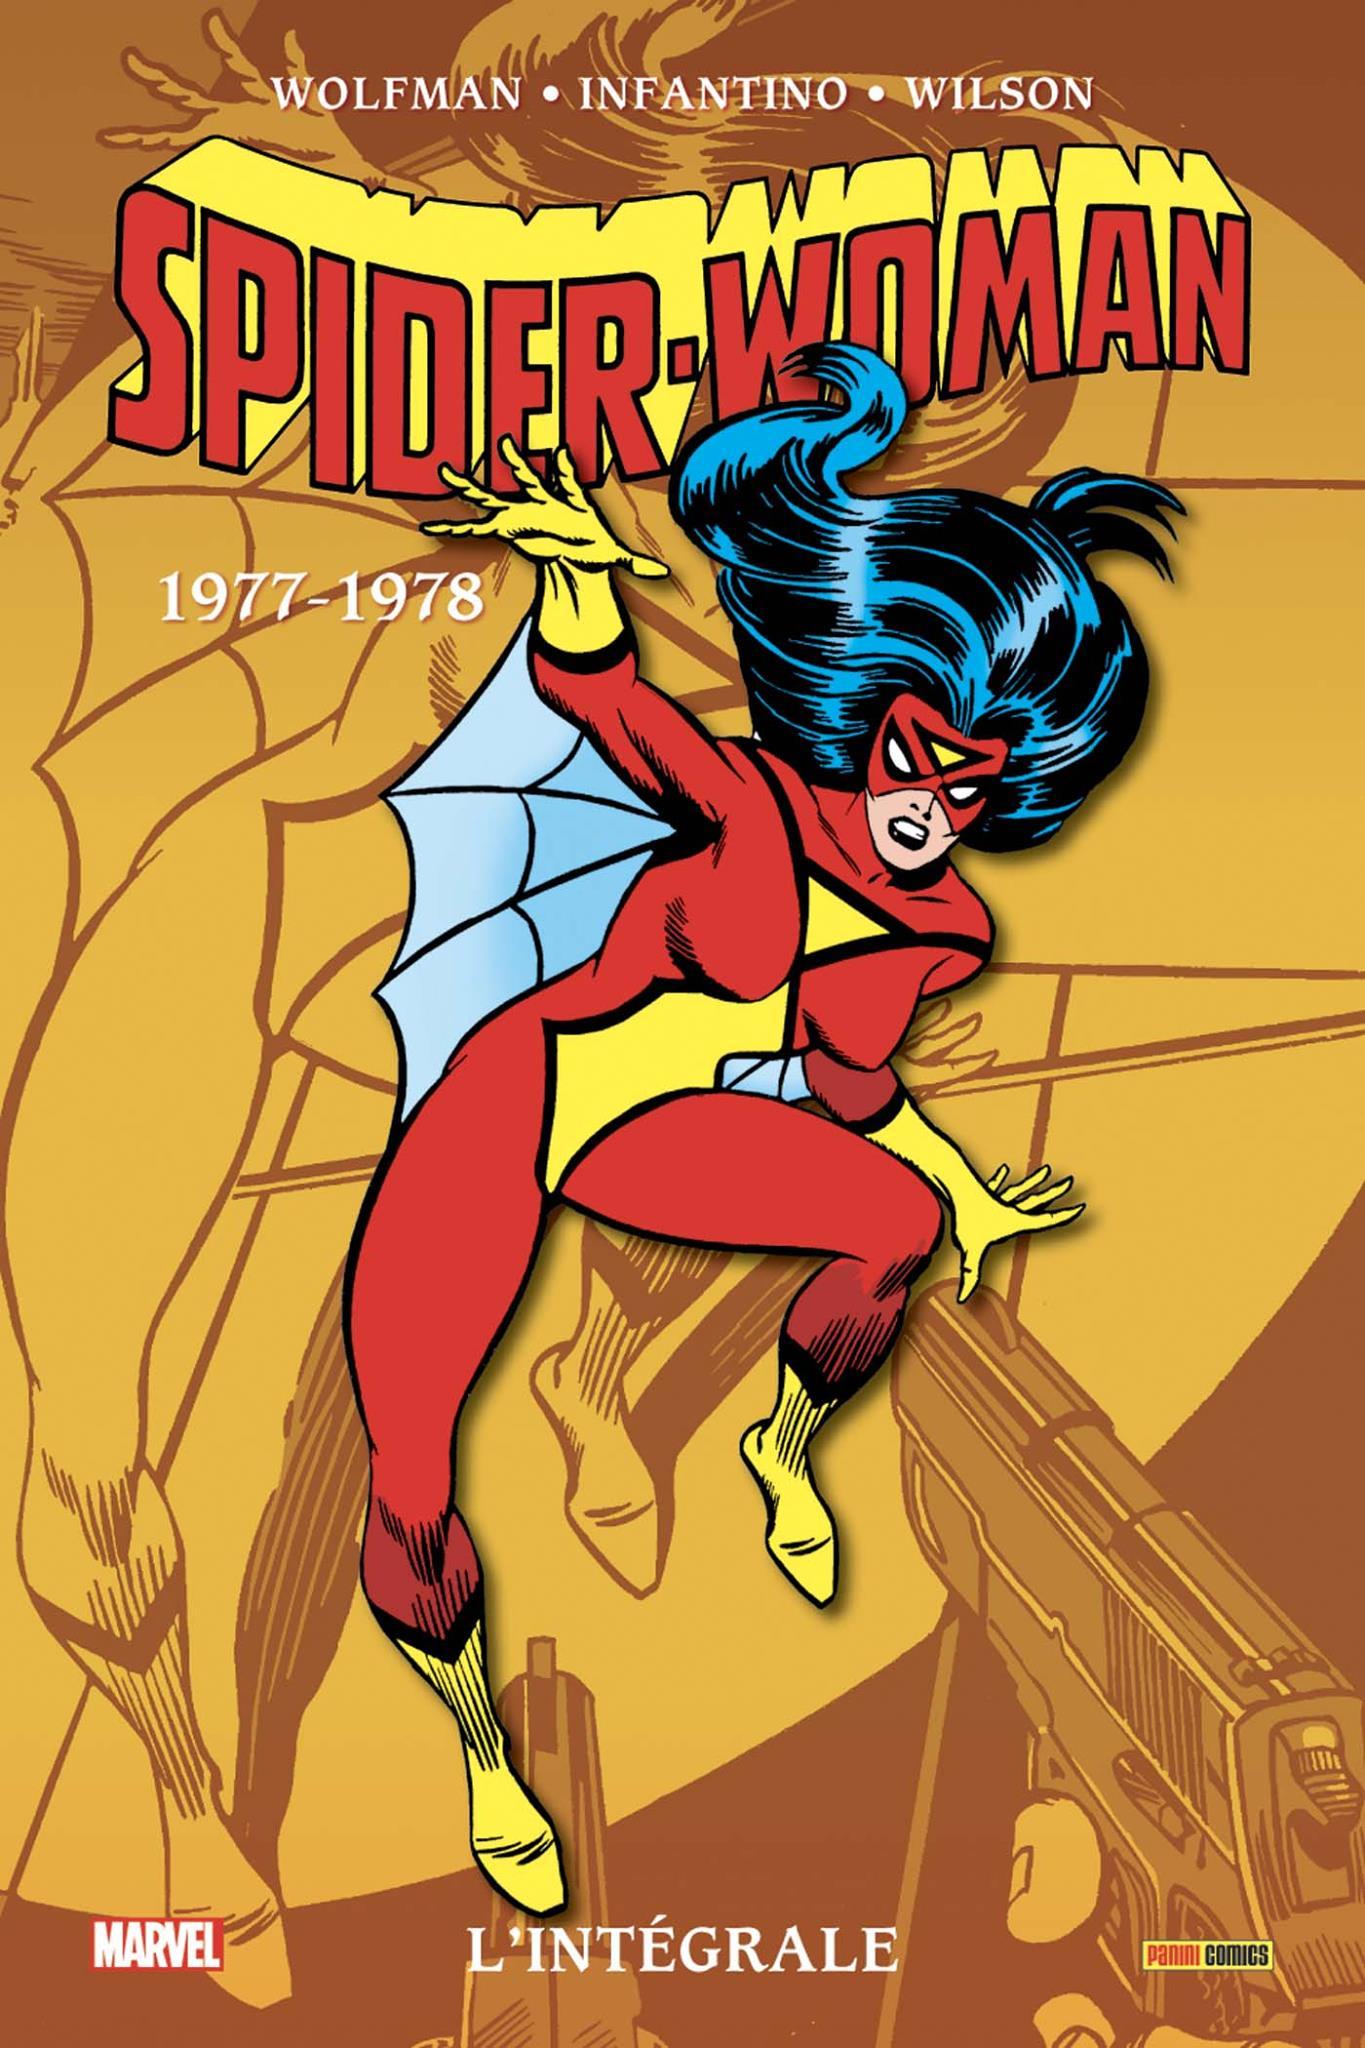 SPIDER-WOMAN : L'INTÉGRALE 1977-1978